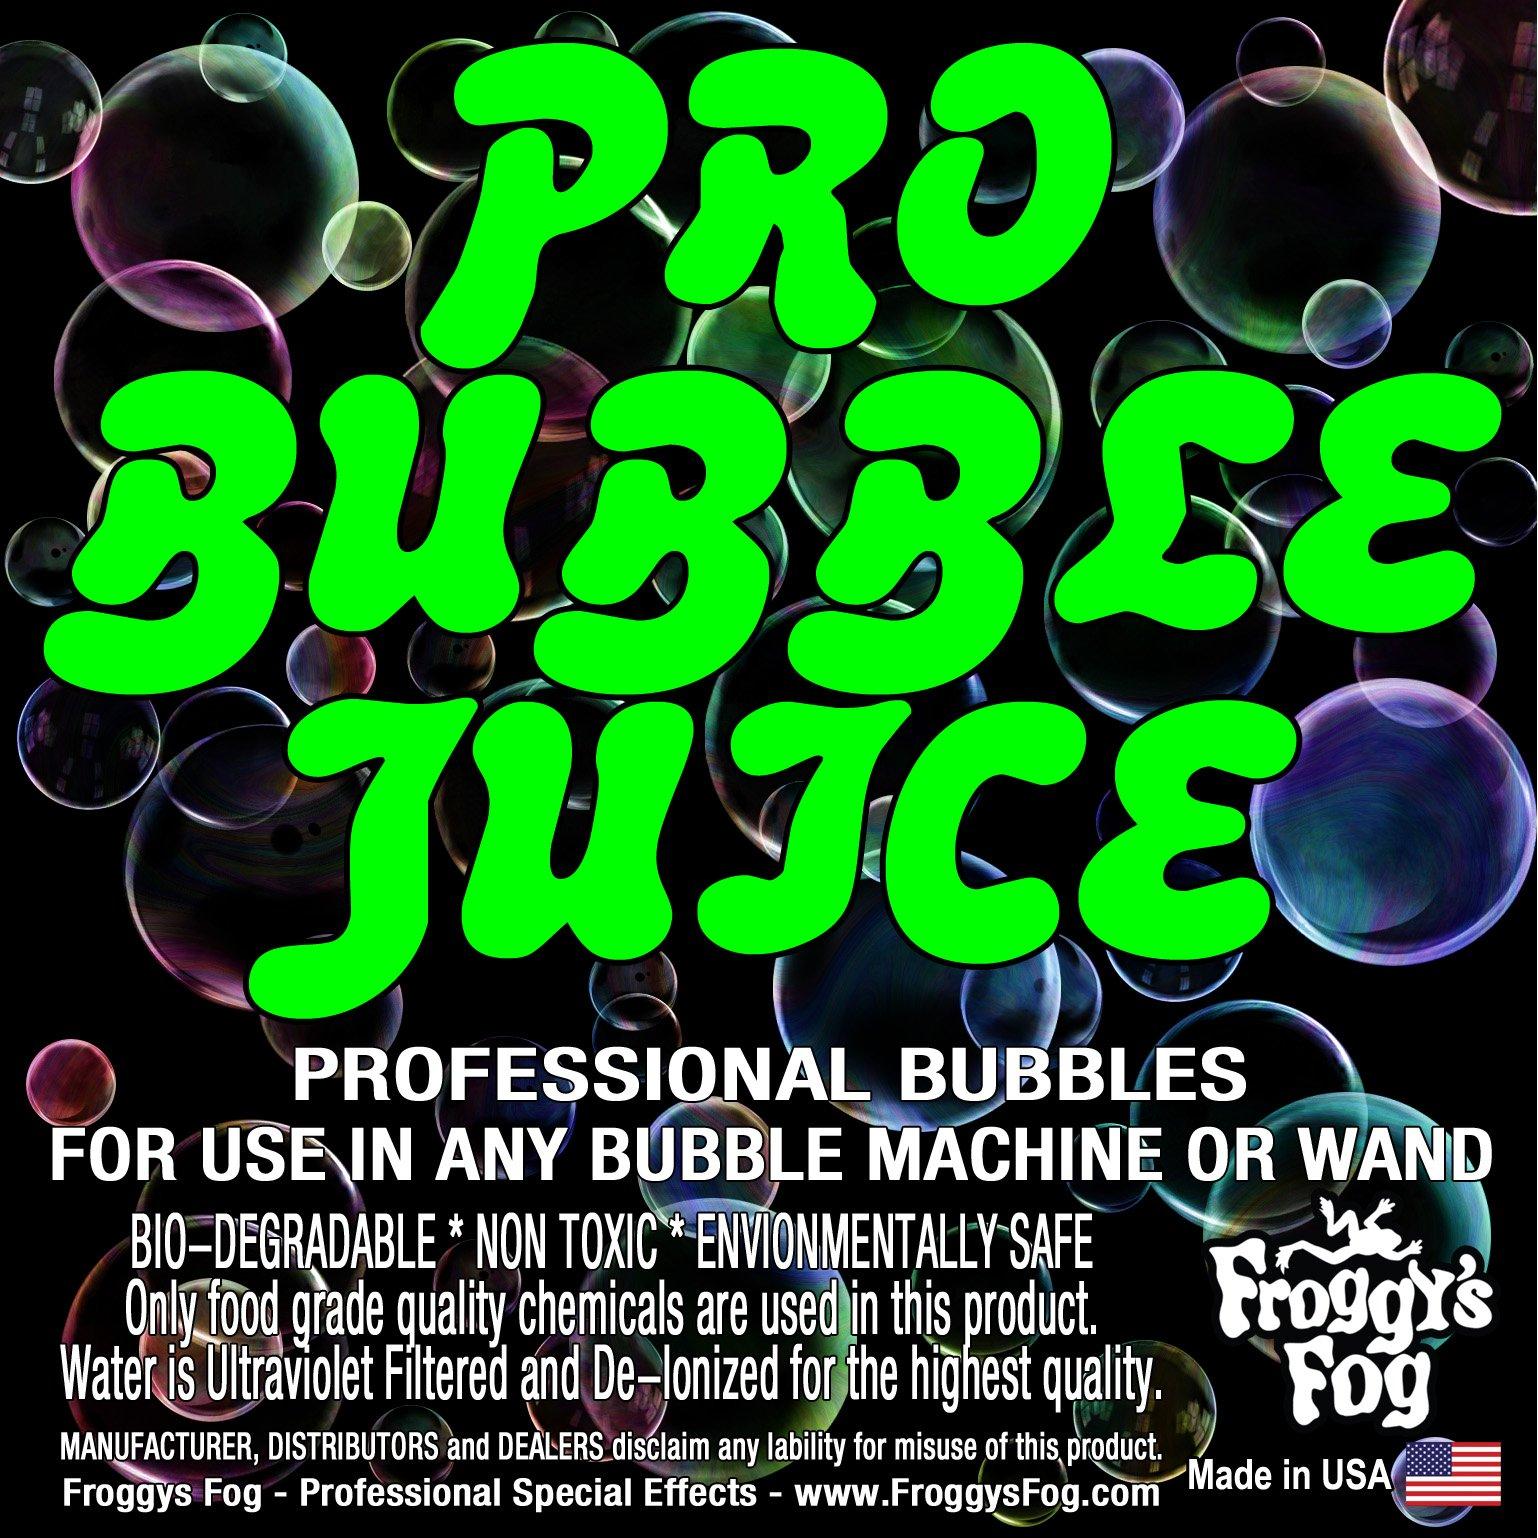 Froggys Fog - Pro Bubble Juice - Professional Bubble Fluid for All Bubble Machines and Bubblers - 4 Gallon Case